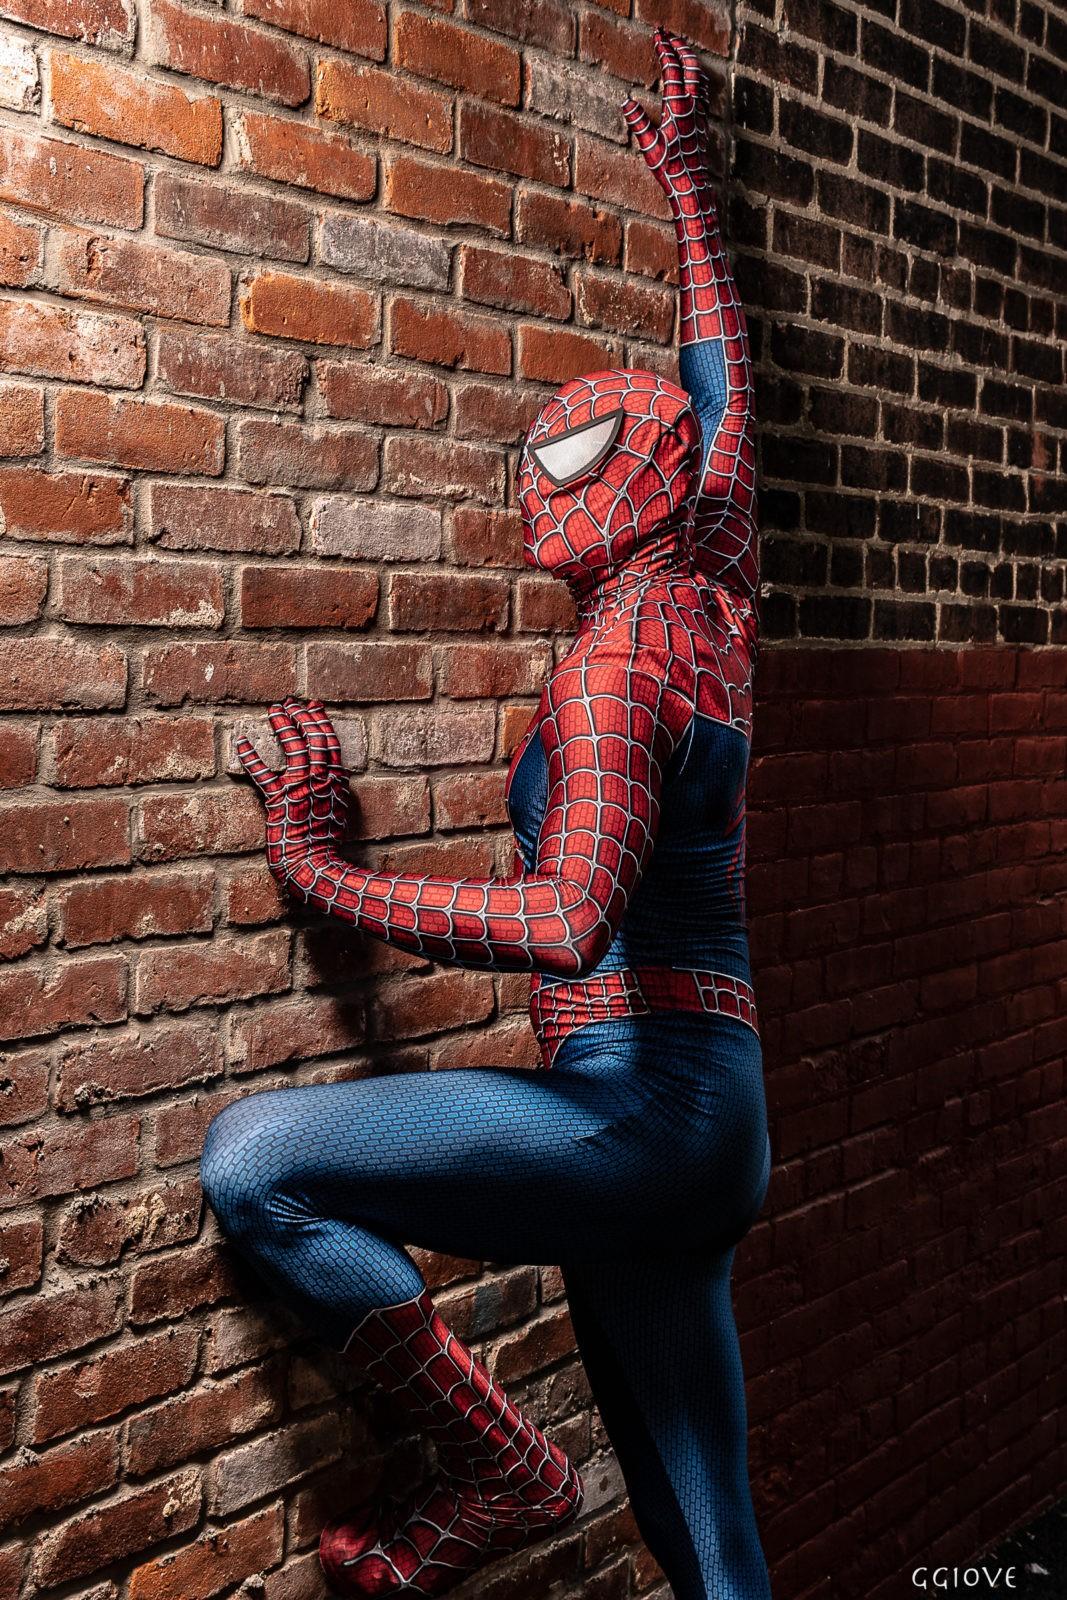 Spider Man having fun